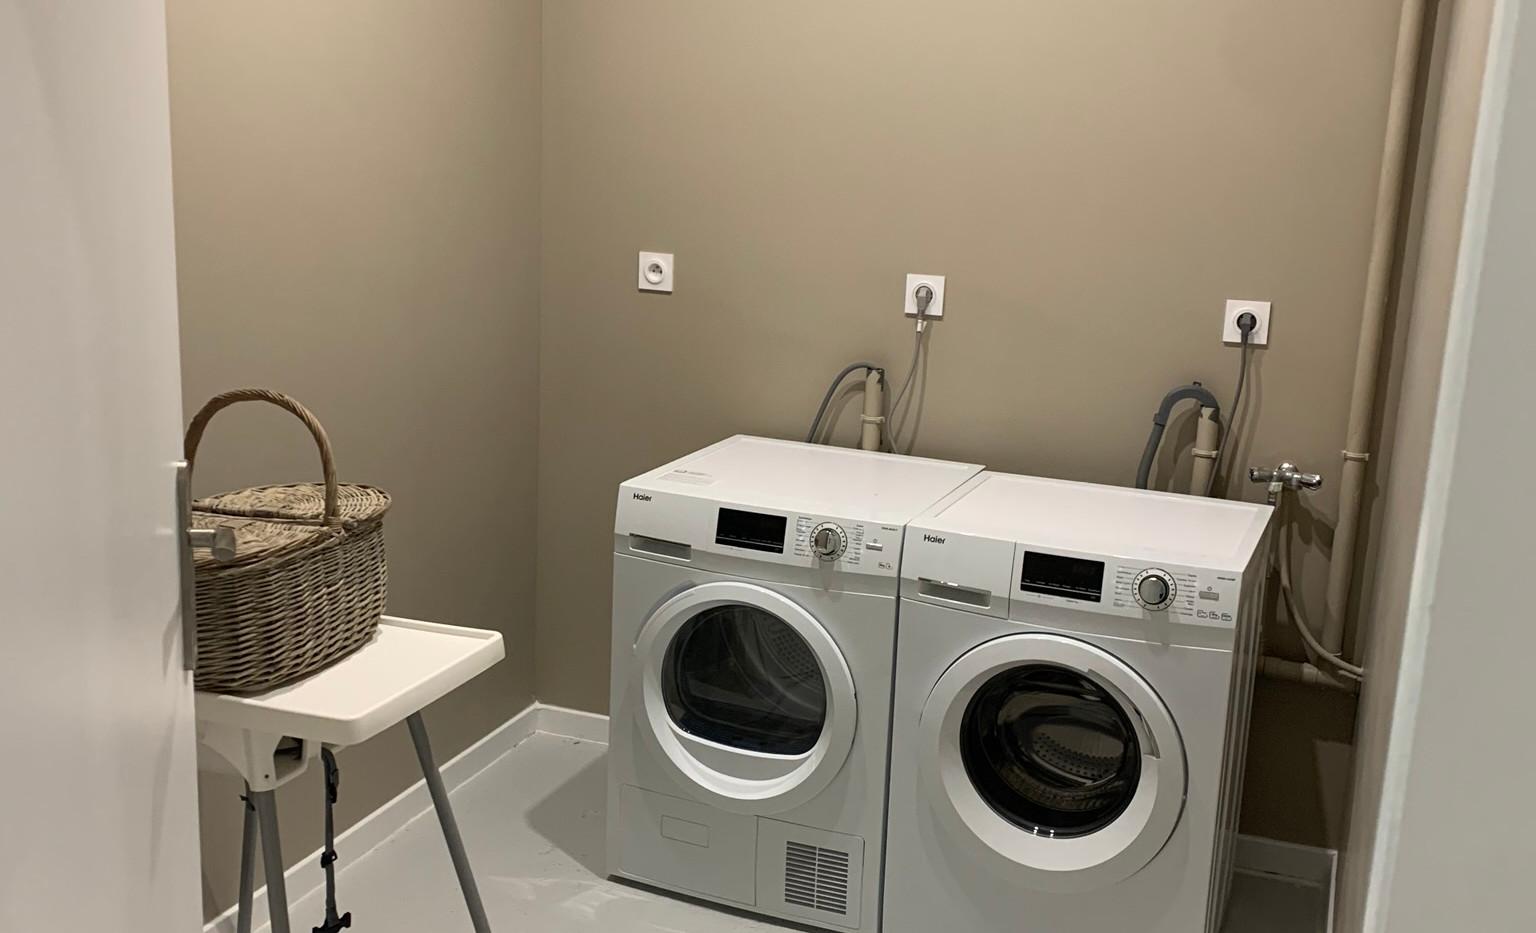 Apartments laundry